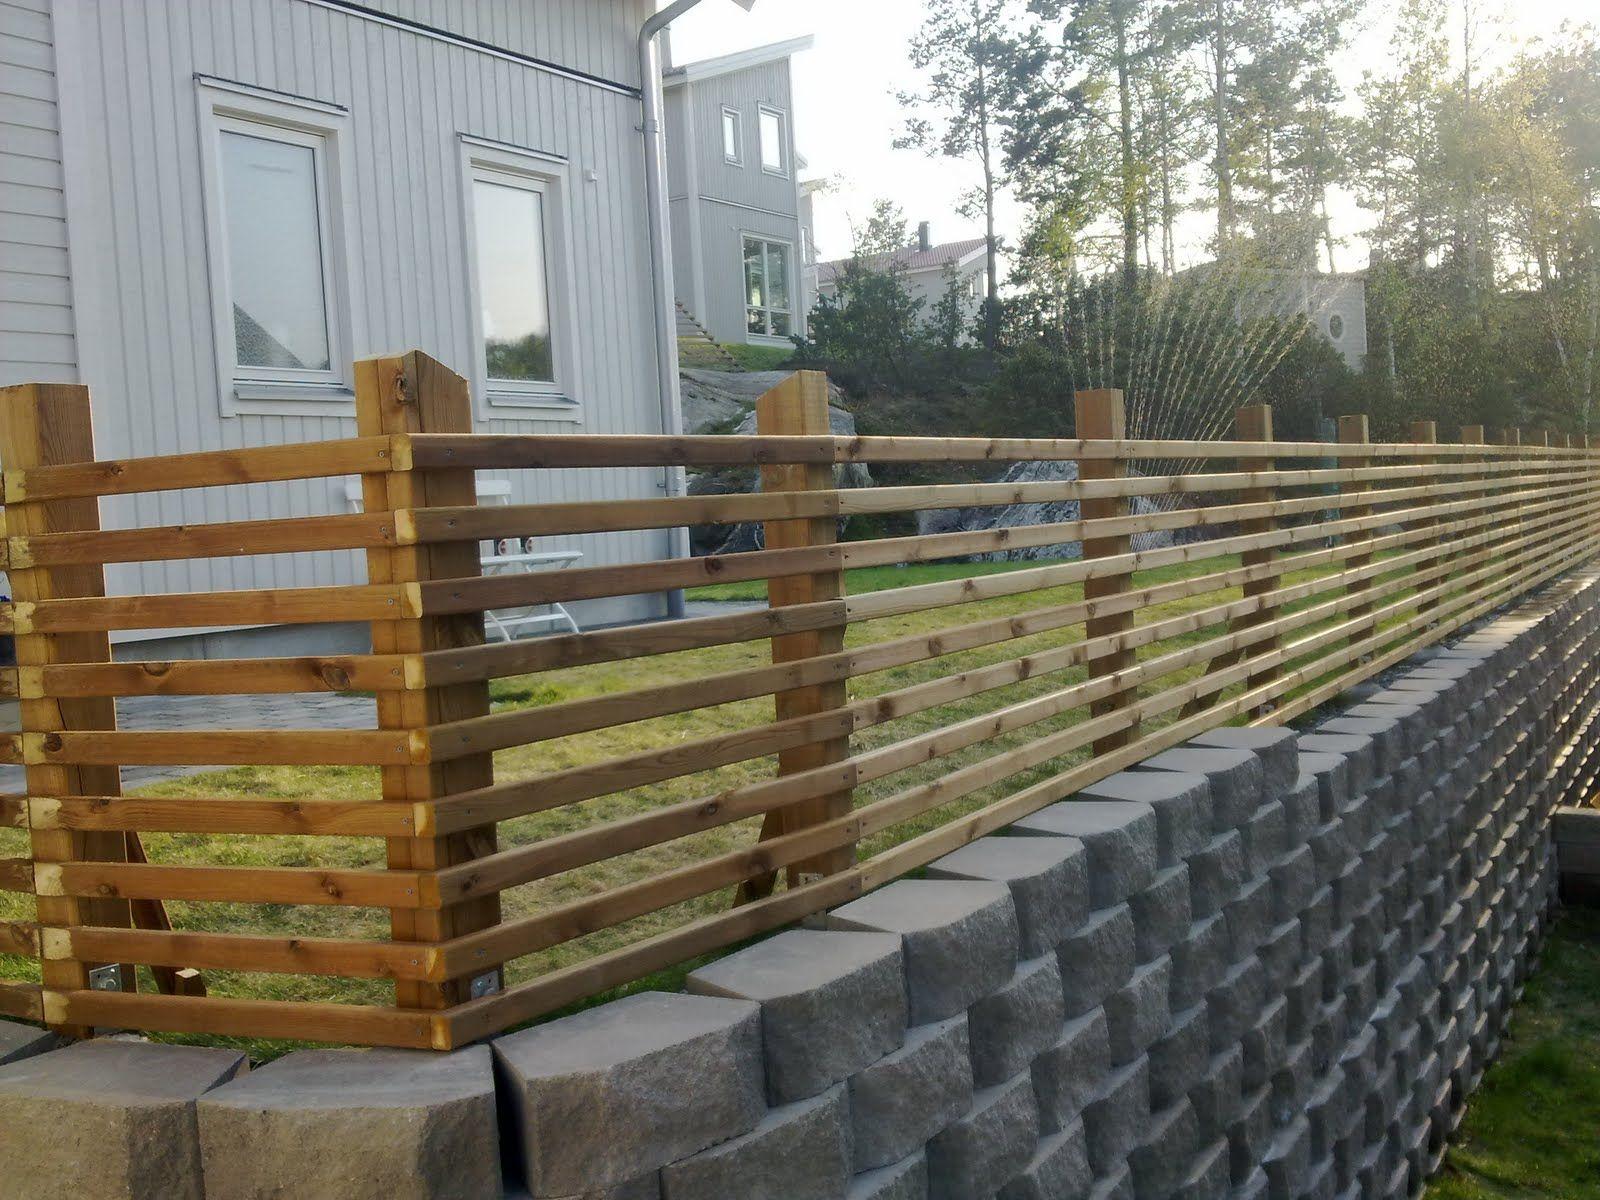 fence ideas Patio garden design, Building a fence, Front